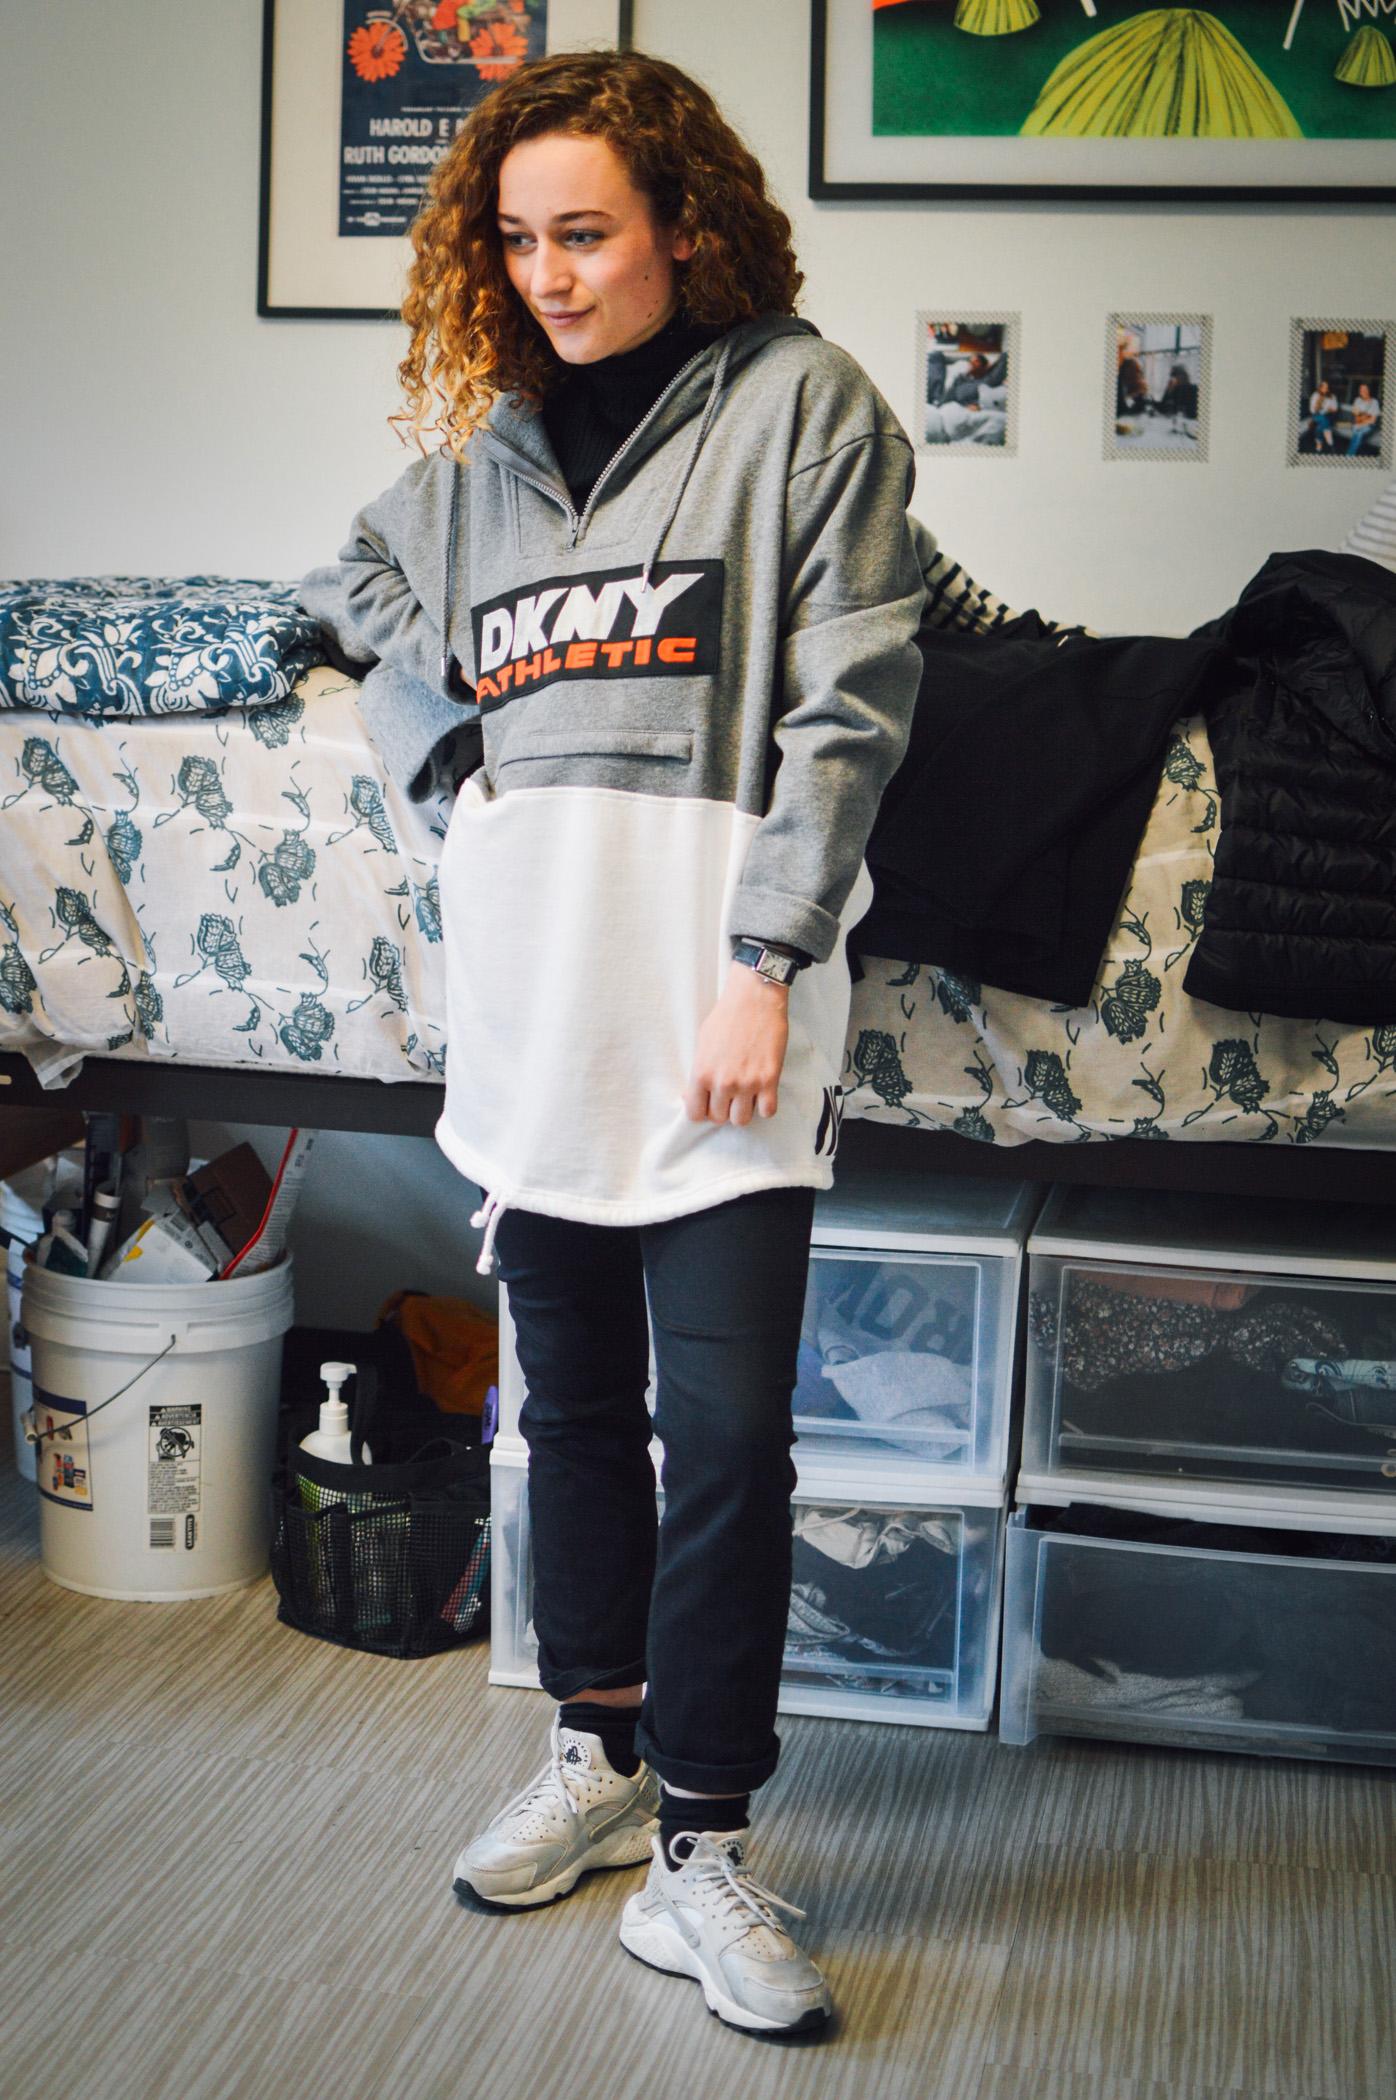 Sweatshirt: DKNY for Opening Ceremony